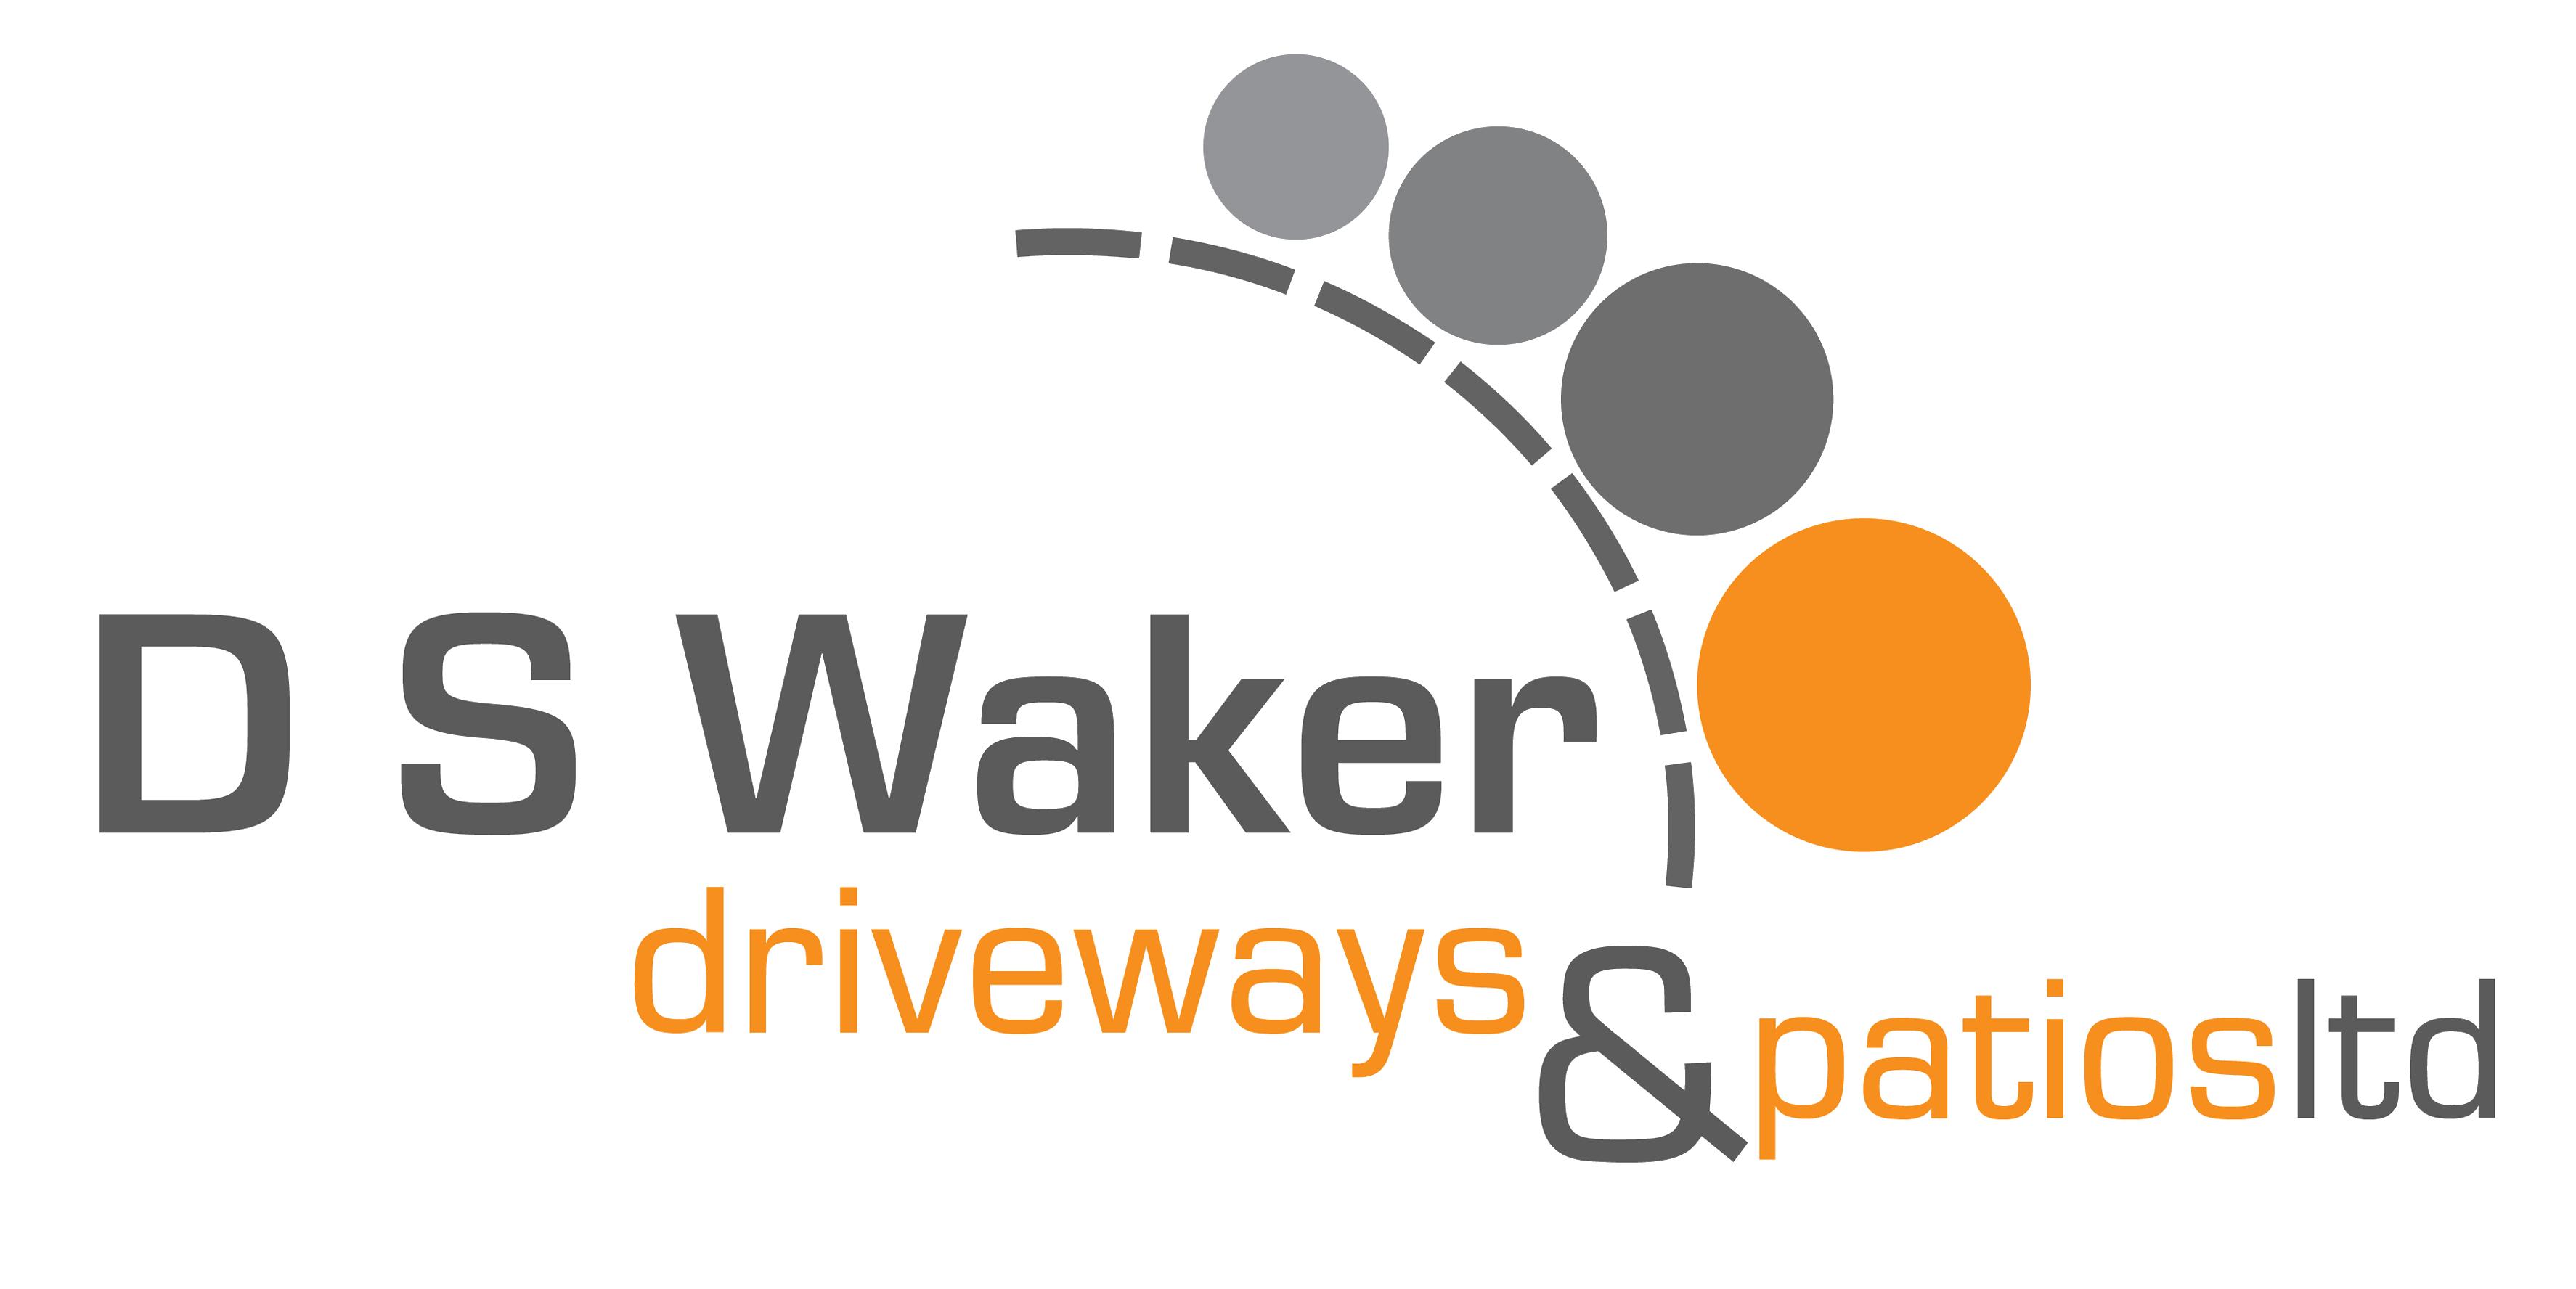 DS Waker Driveways